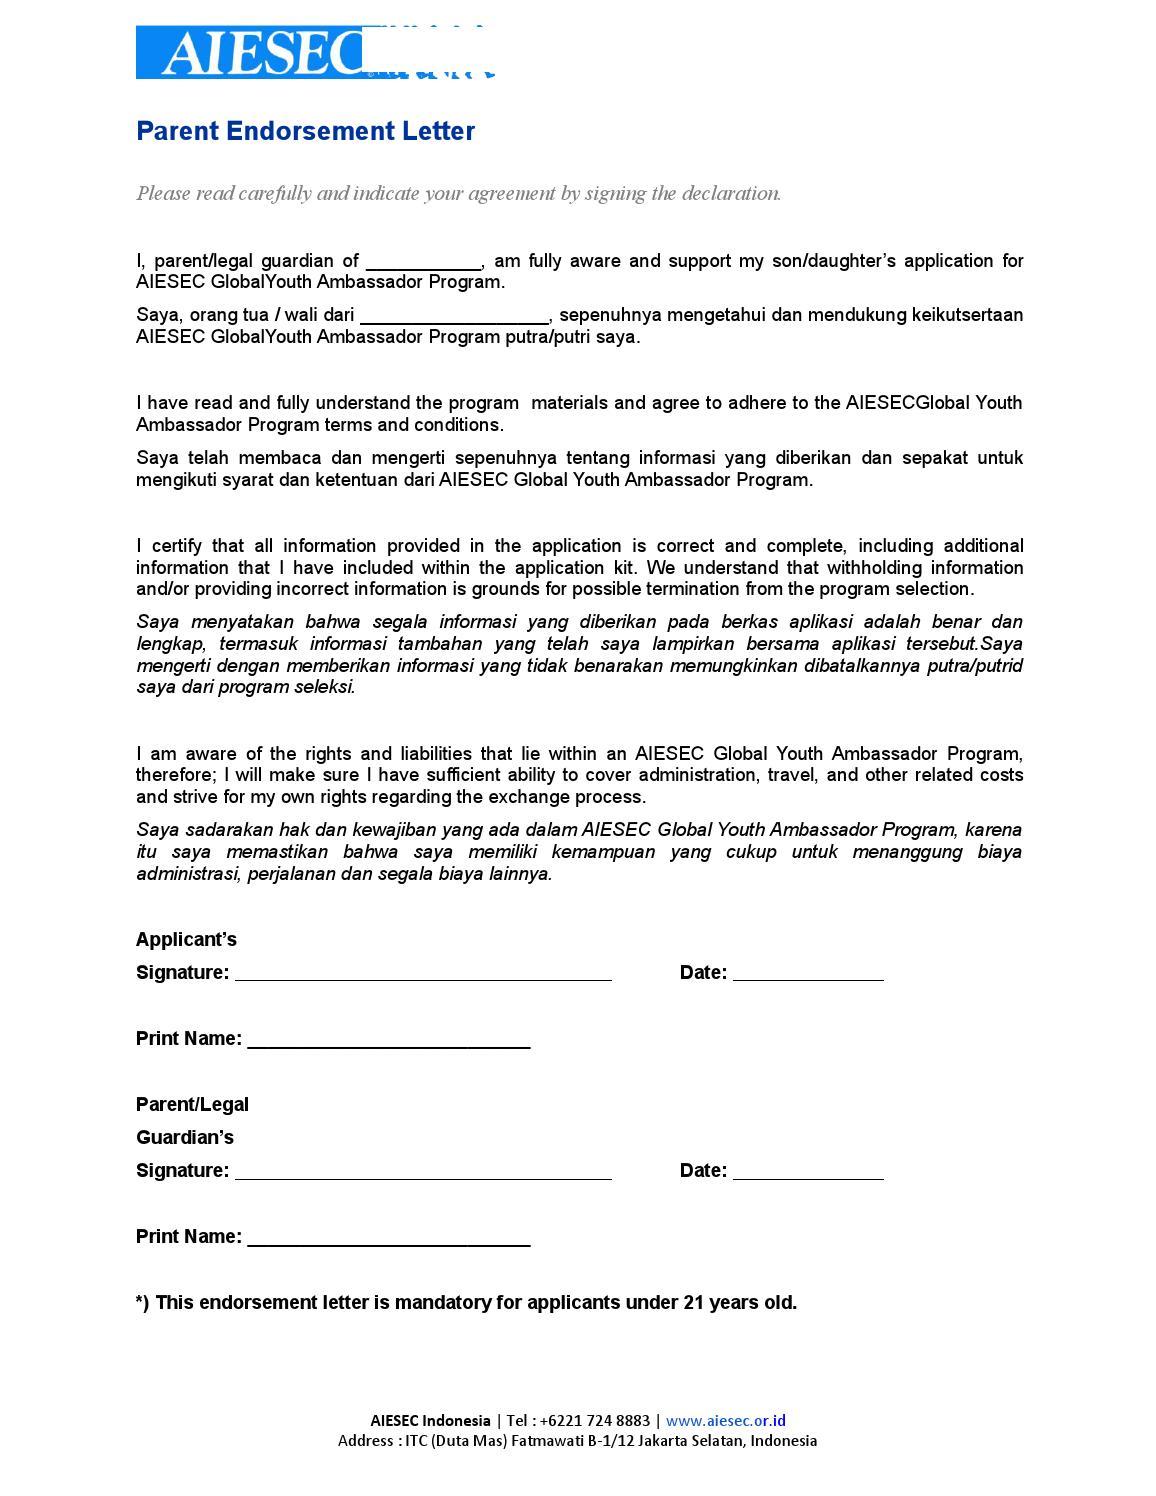 parent endorsement letter by aiesec lc undip tn list issuu